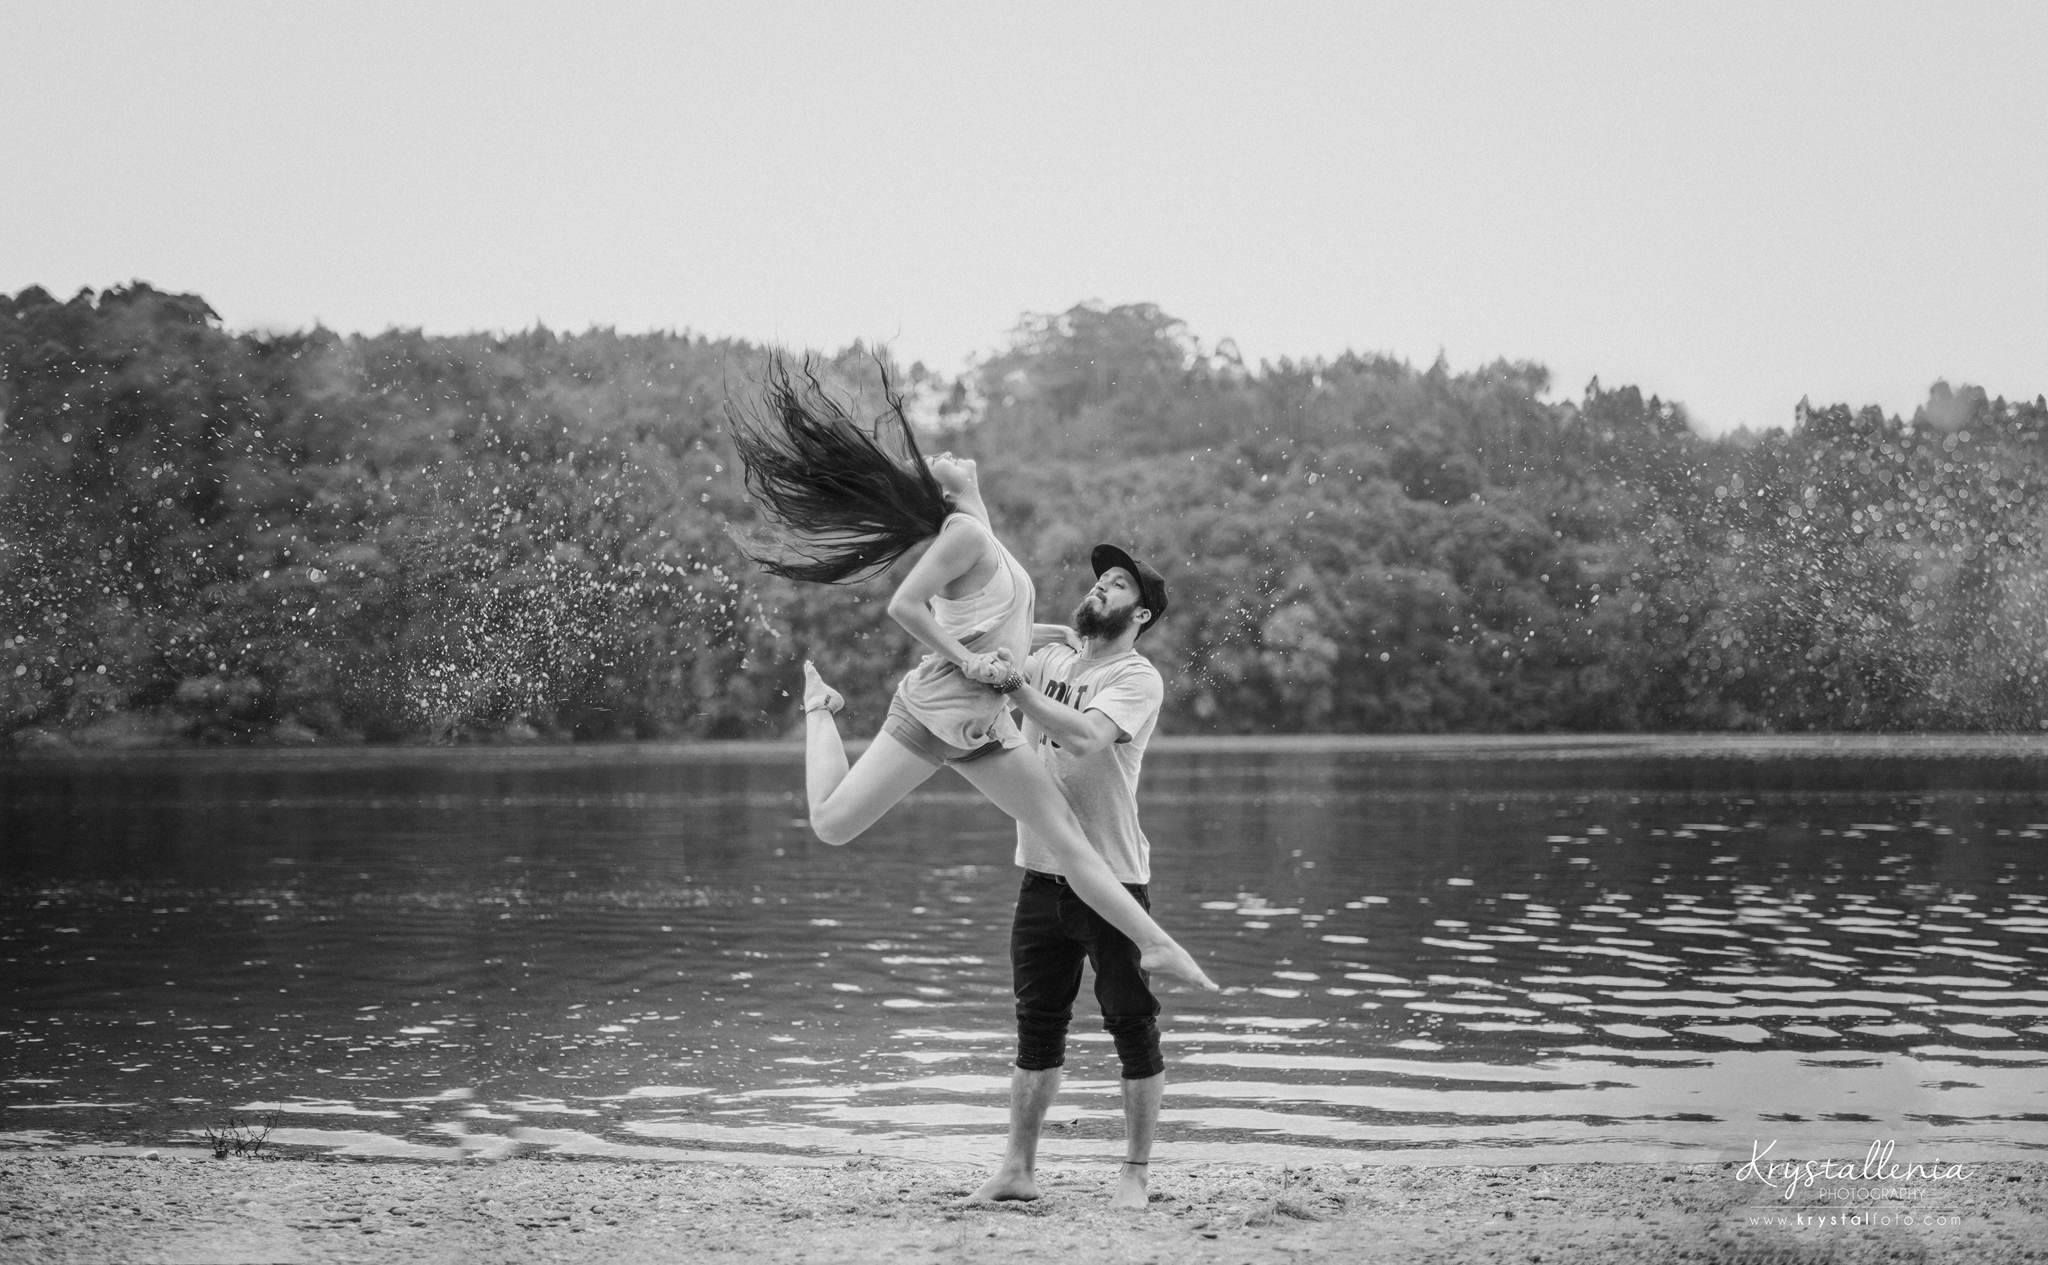 Milena Morais & Valmir Coelho